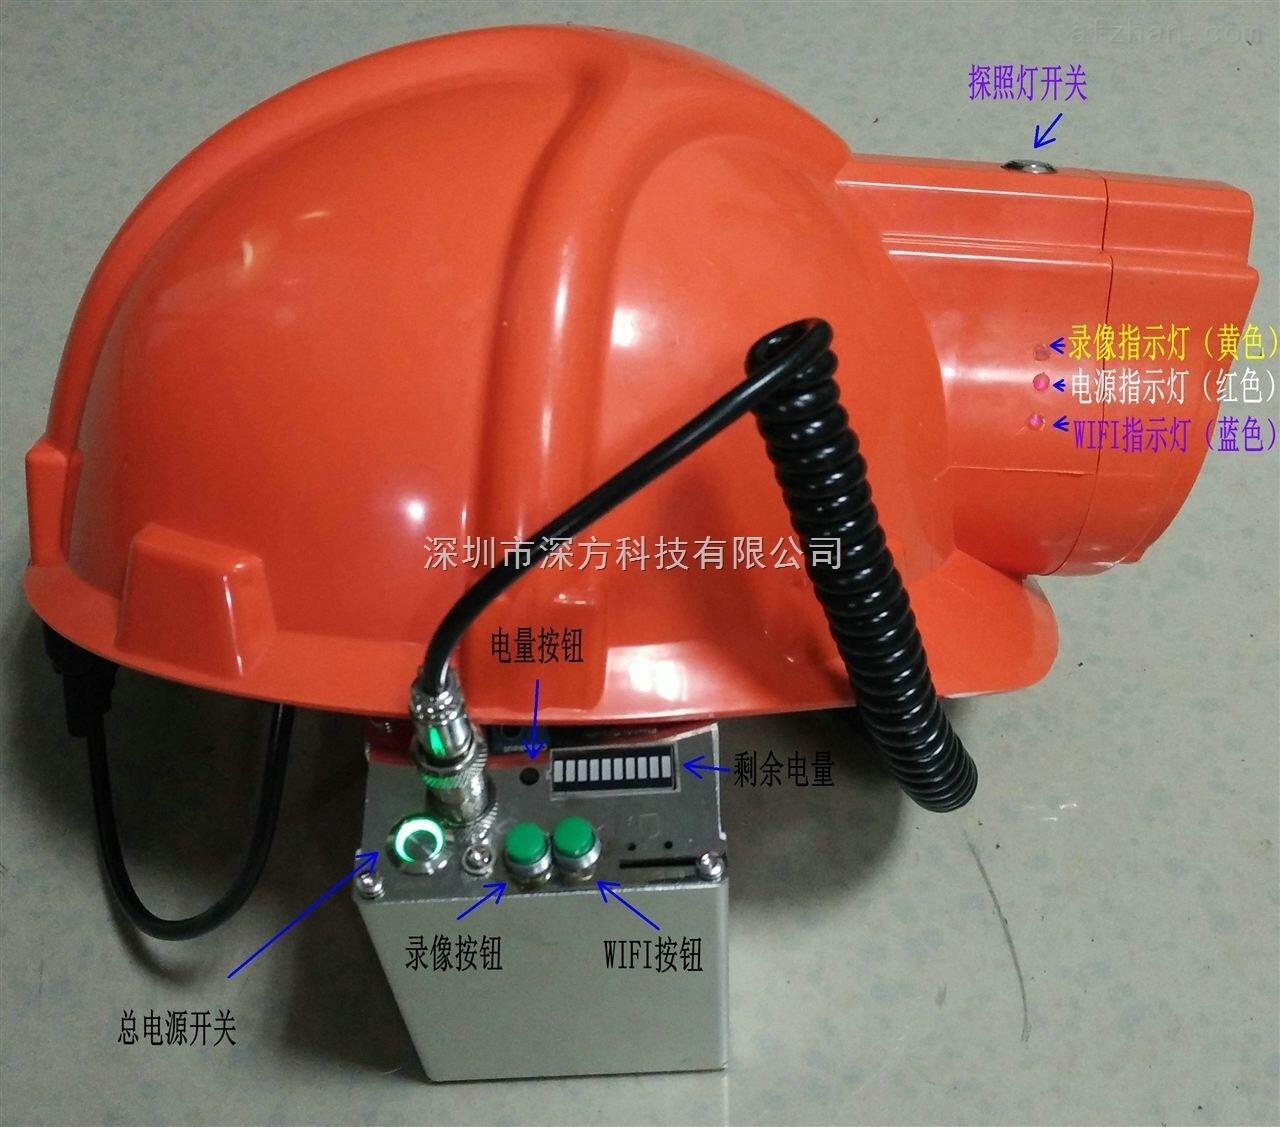 4G高清头盔 4G单兵应急指挥终端 4G布控球